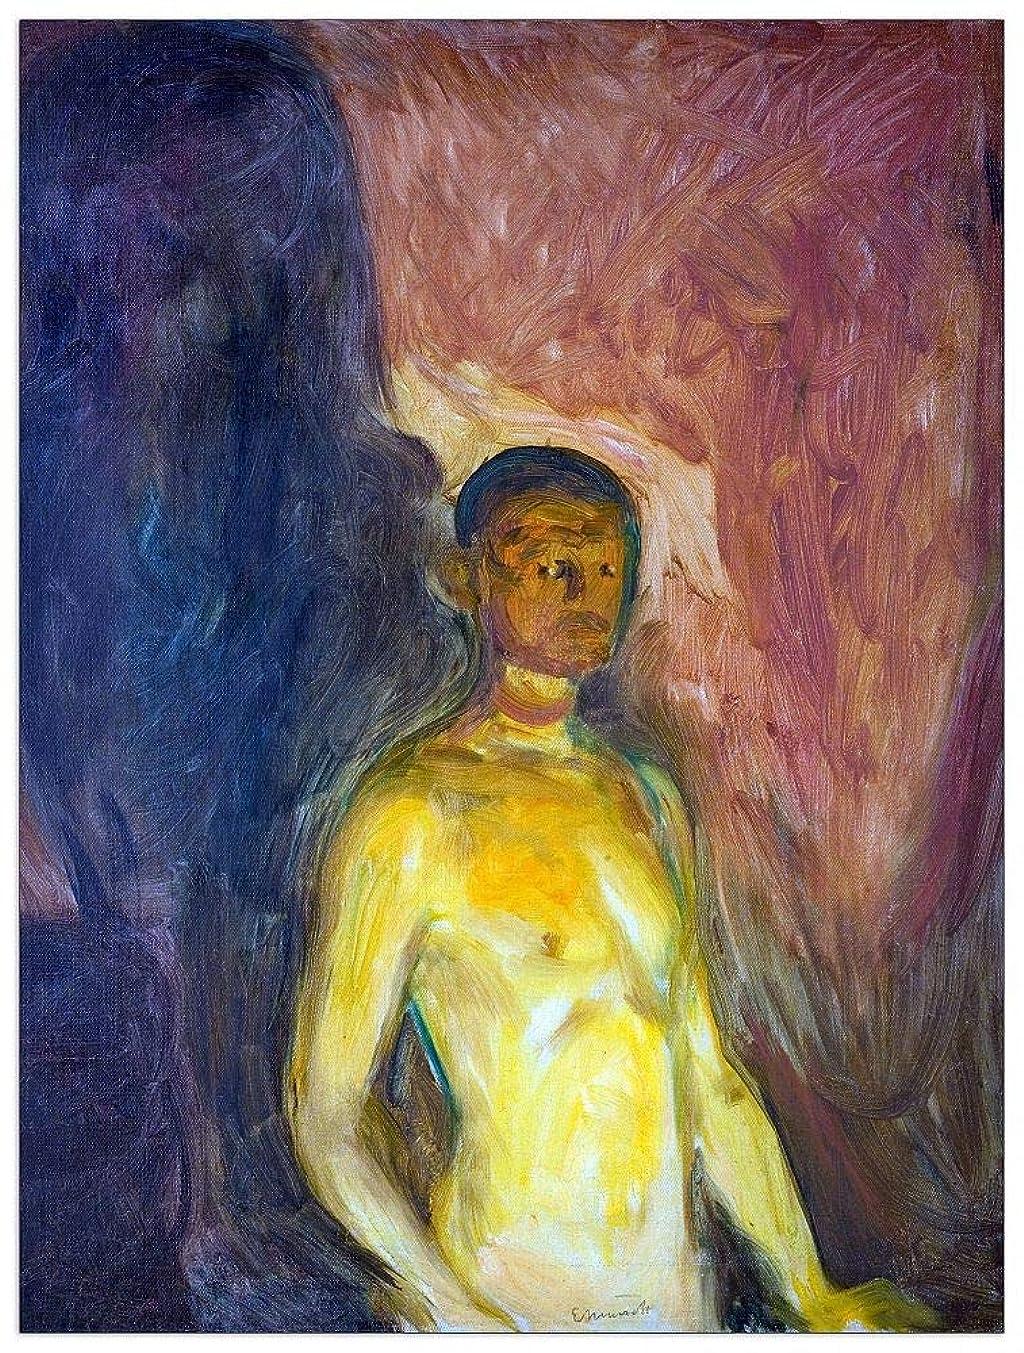 ArtPlaza TW92292 Munch Edvard - Portrait in Hell Decorative Panel 27.5x35.5 Inch Multicolored